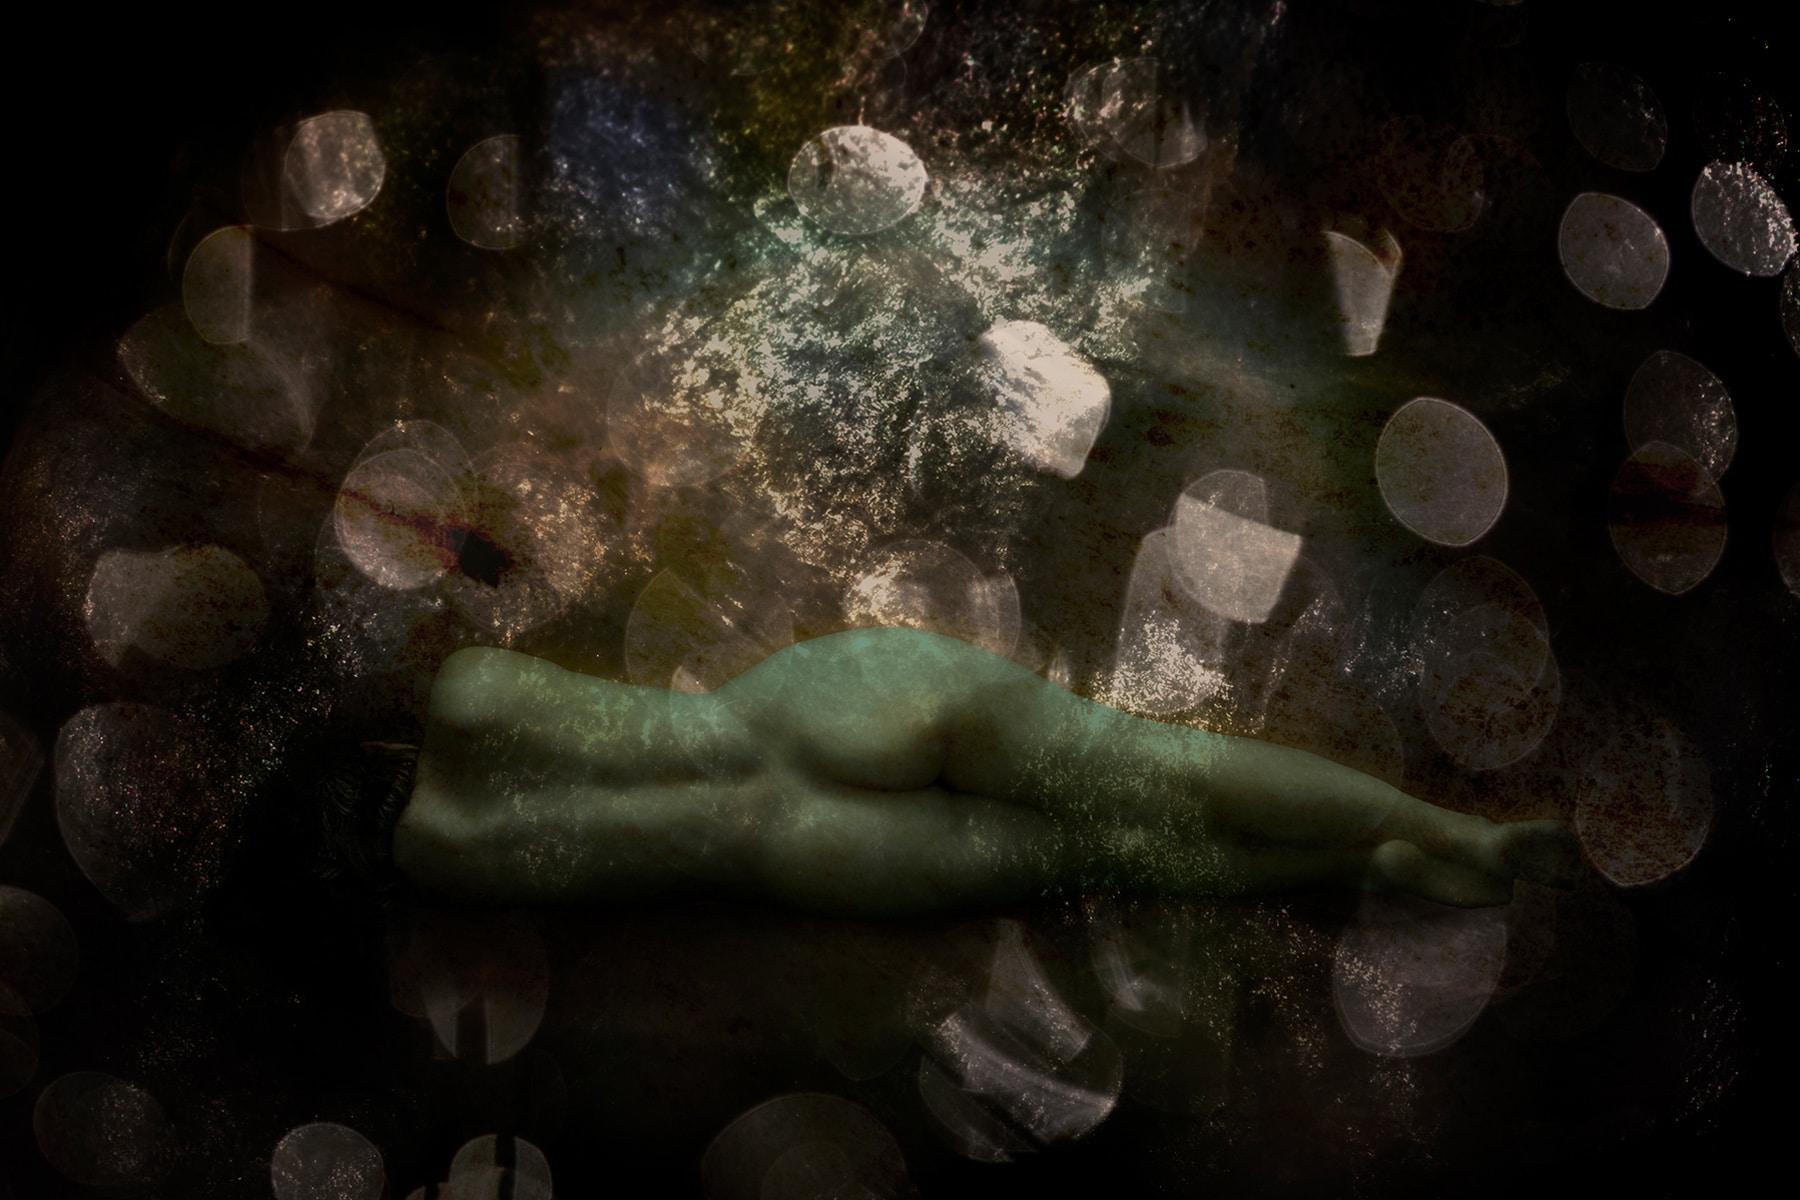 Akt-Aktfotografie-Nude-Fotostudio-Burgdorf-Haldemann